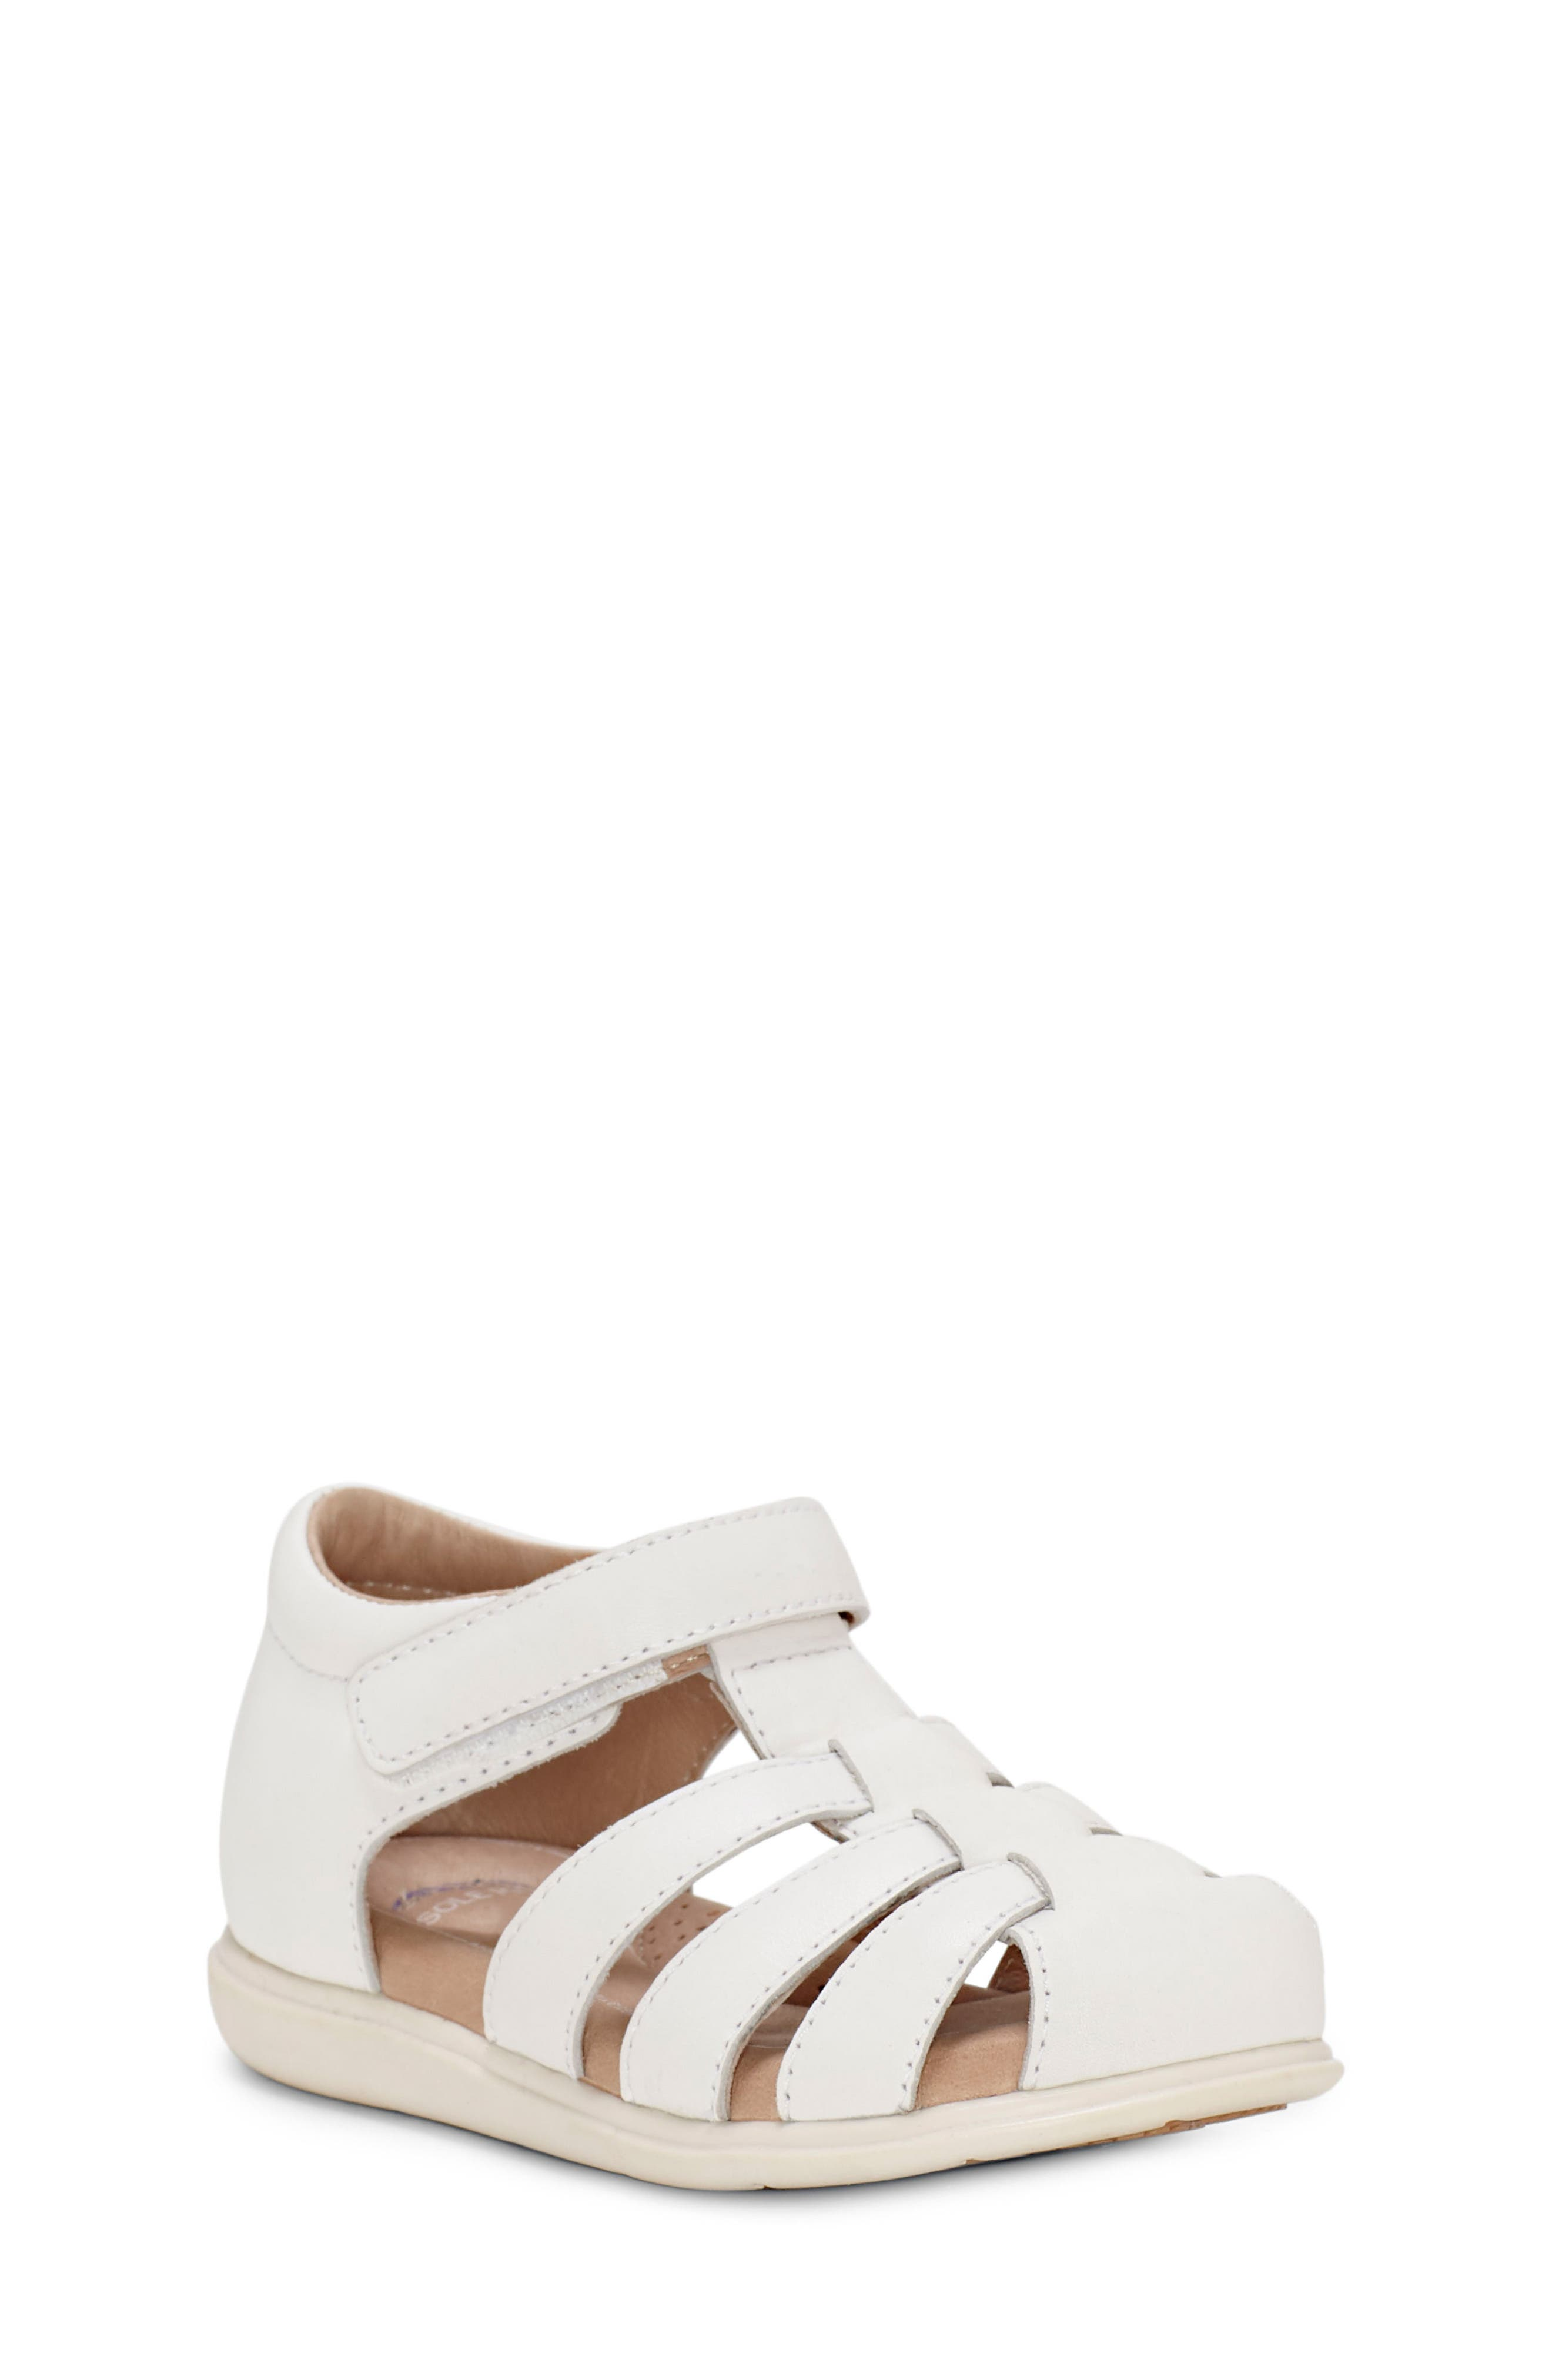 SOLE PLAY Caleb Sandal, Main, color, WHITE